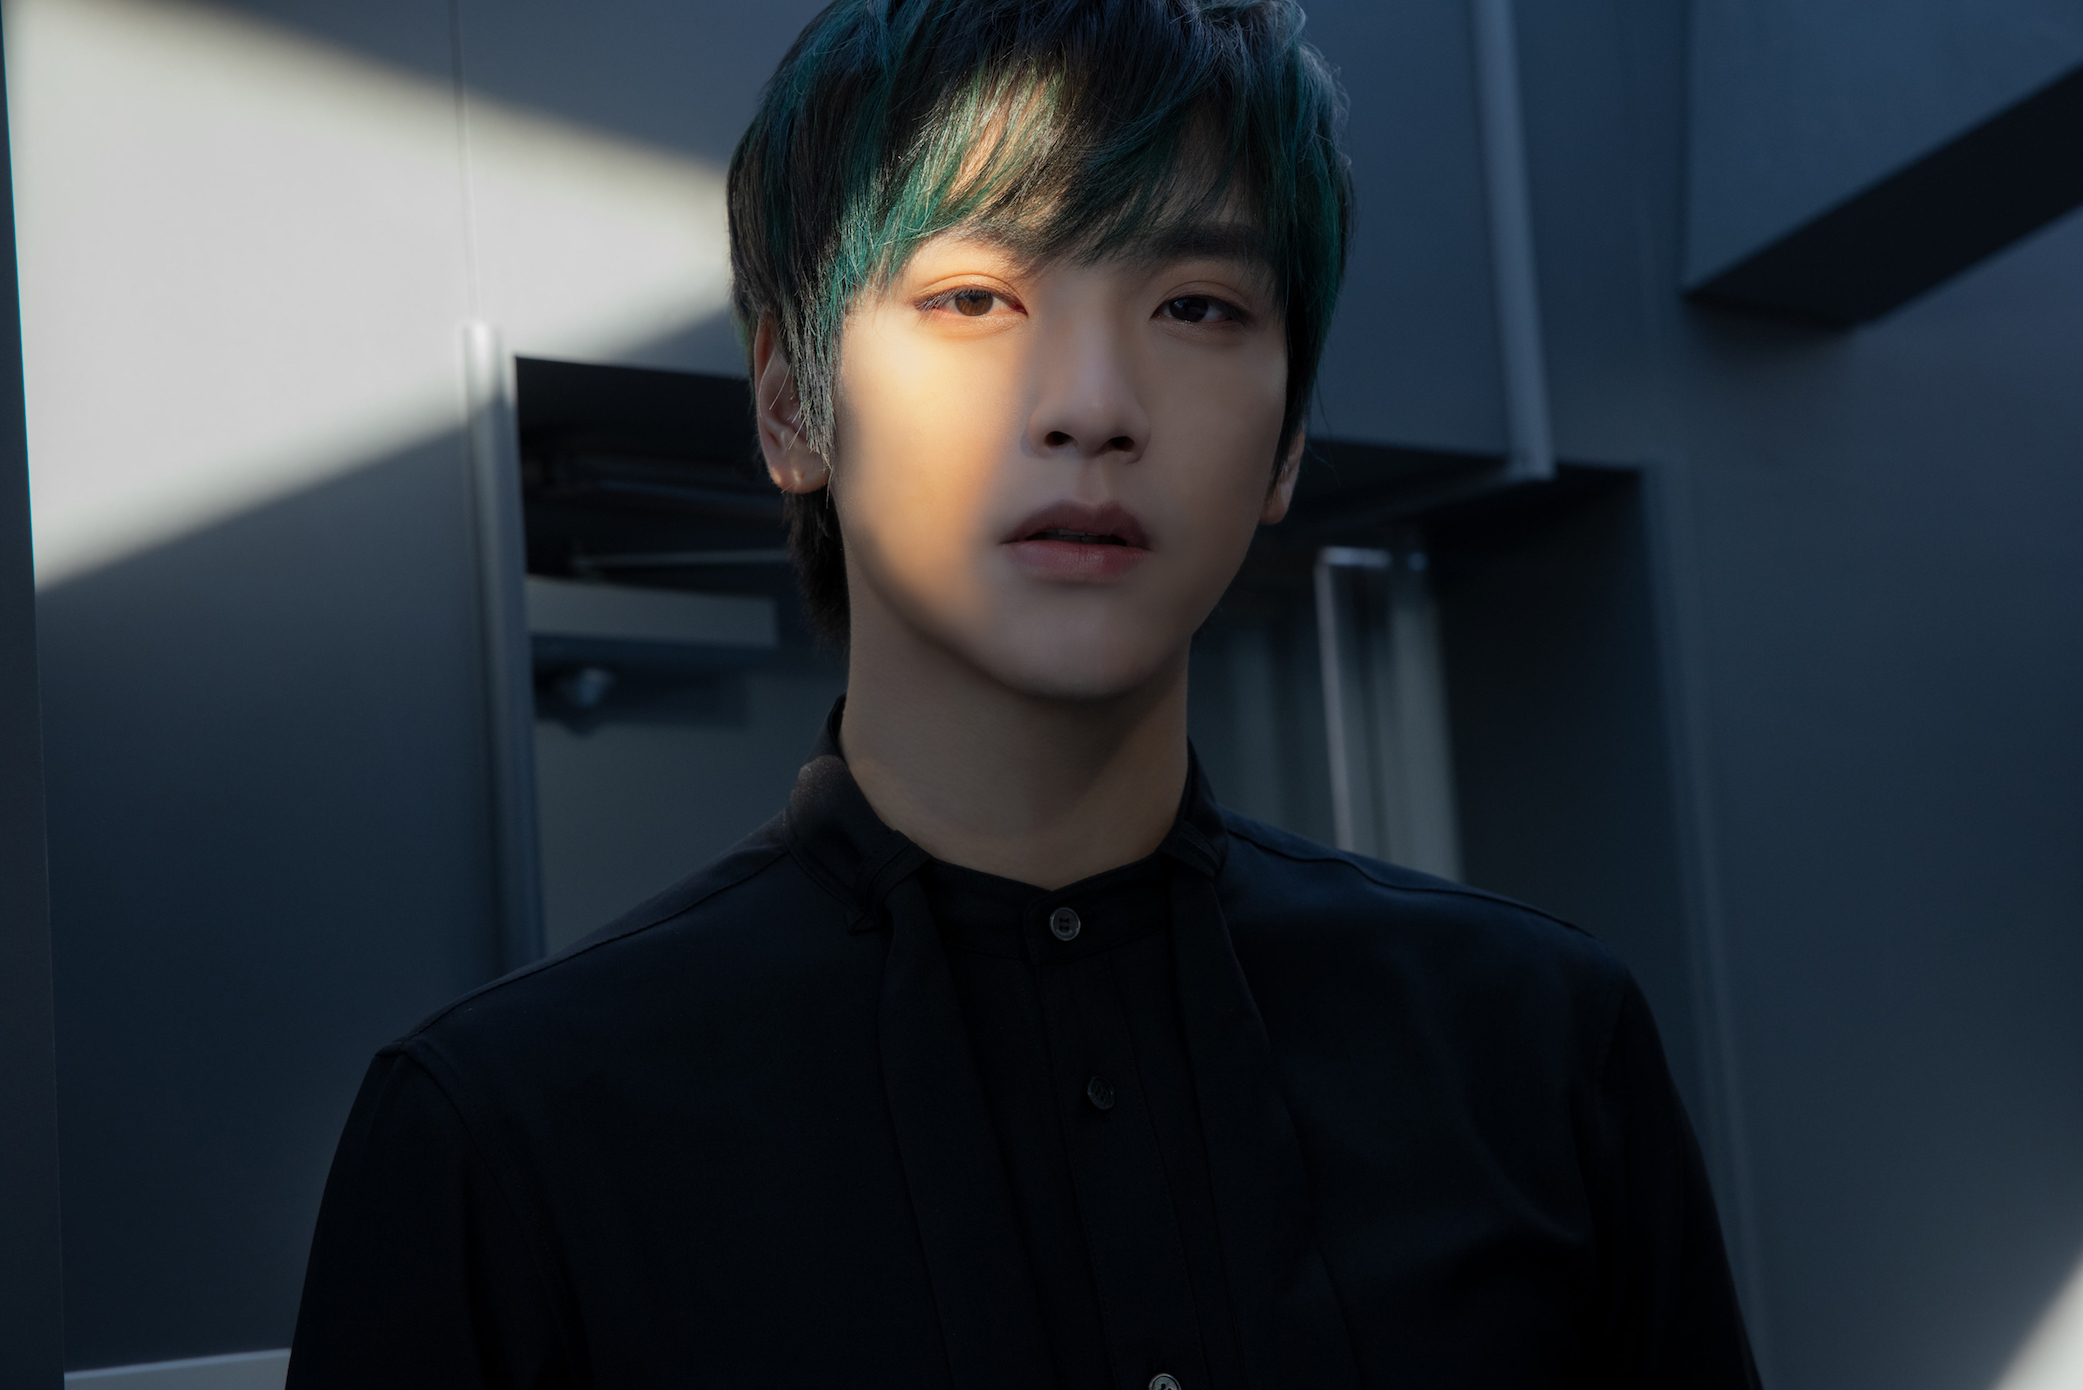 N.Flyingのジェヒョンさんが、日本のドラマ「君と世界が終わる日に」で魅力を発揮!_1_4-3